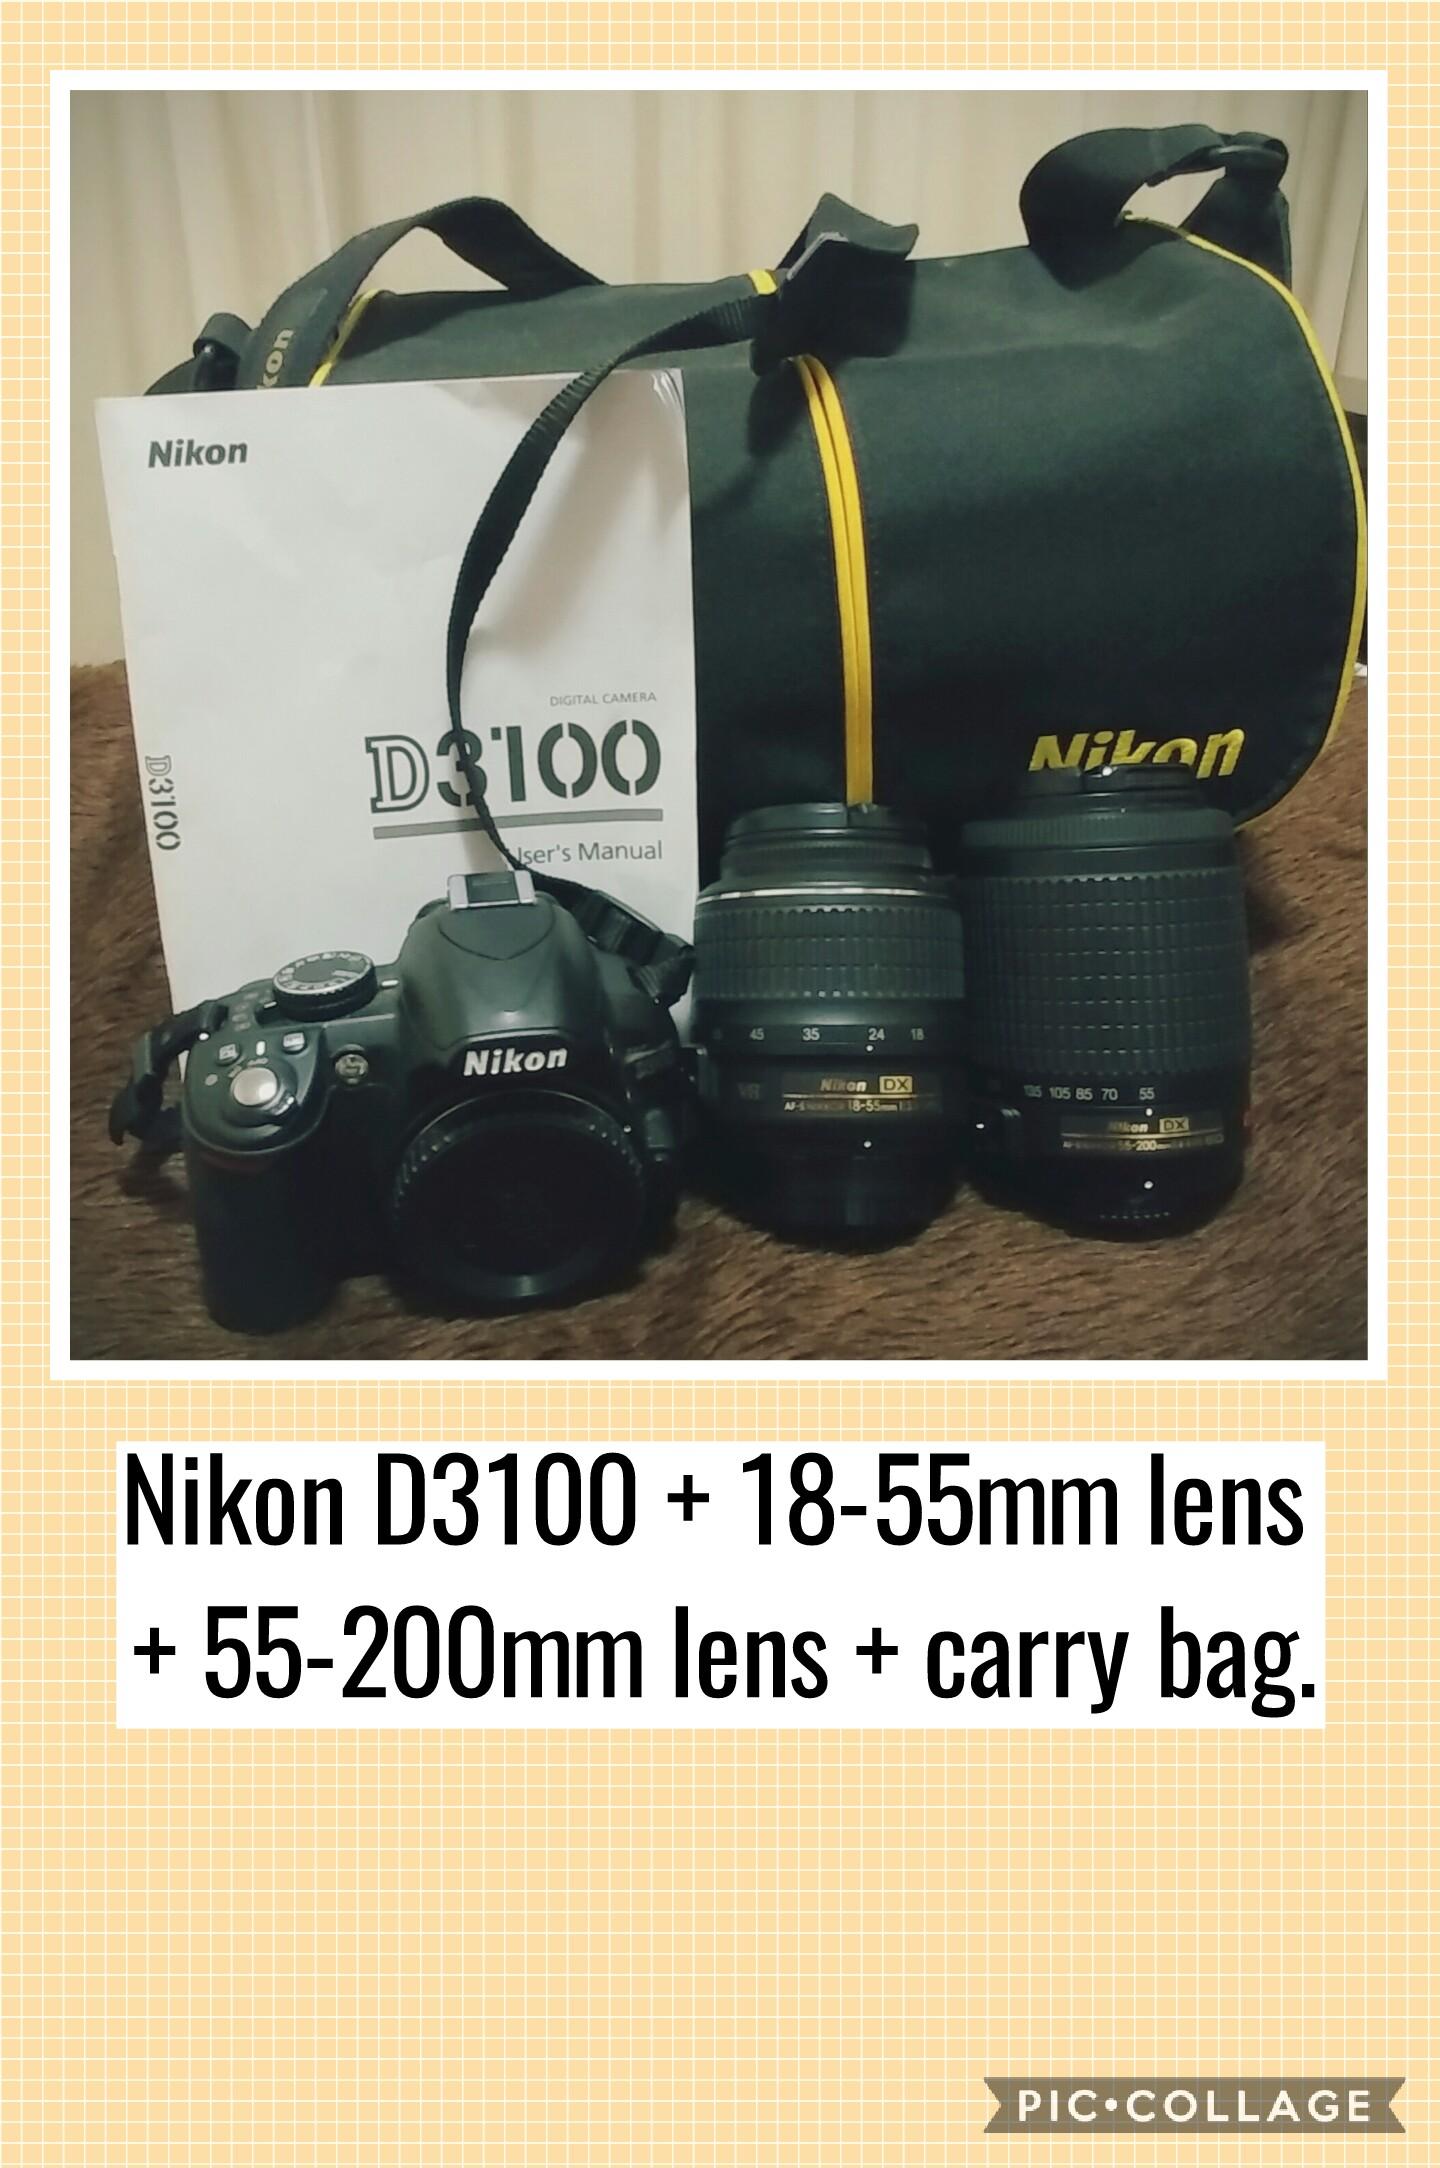 Nikon D3100 + 2 Lenses + Carry Bag | Junk Mail